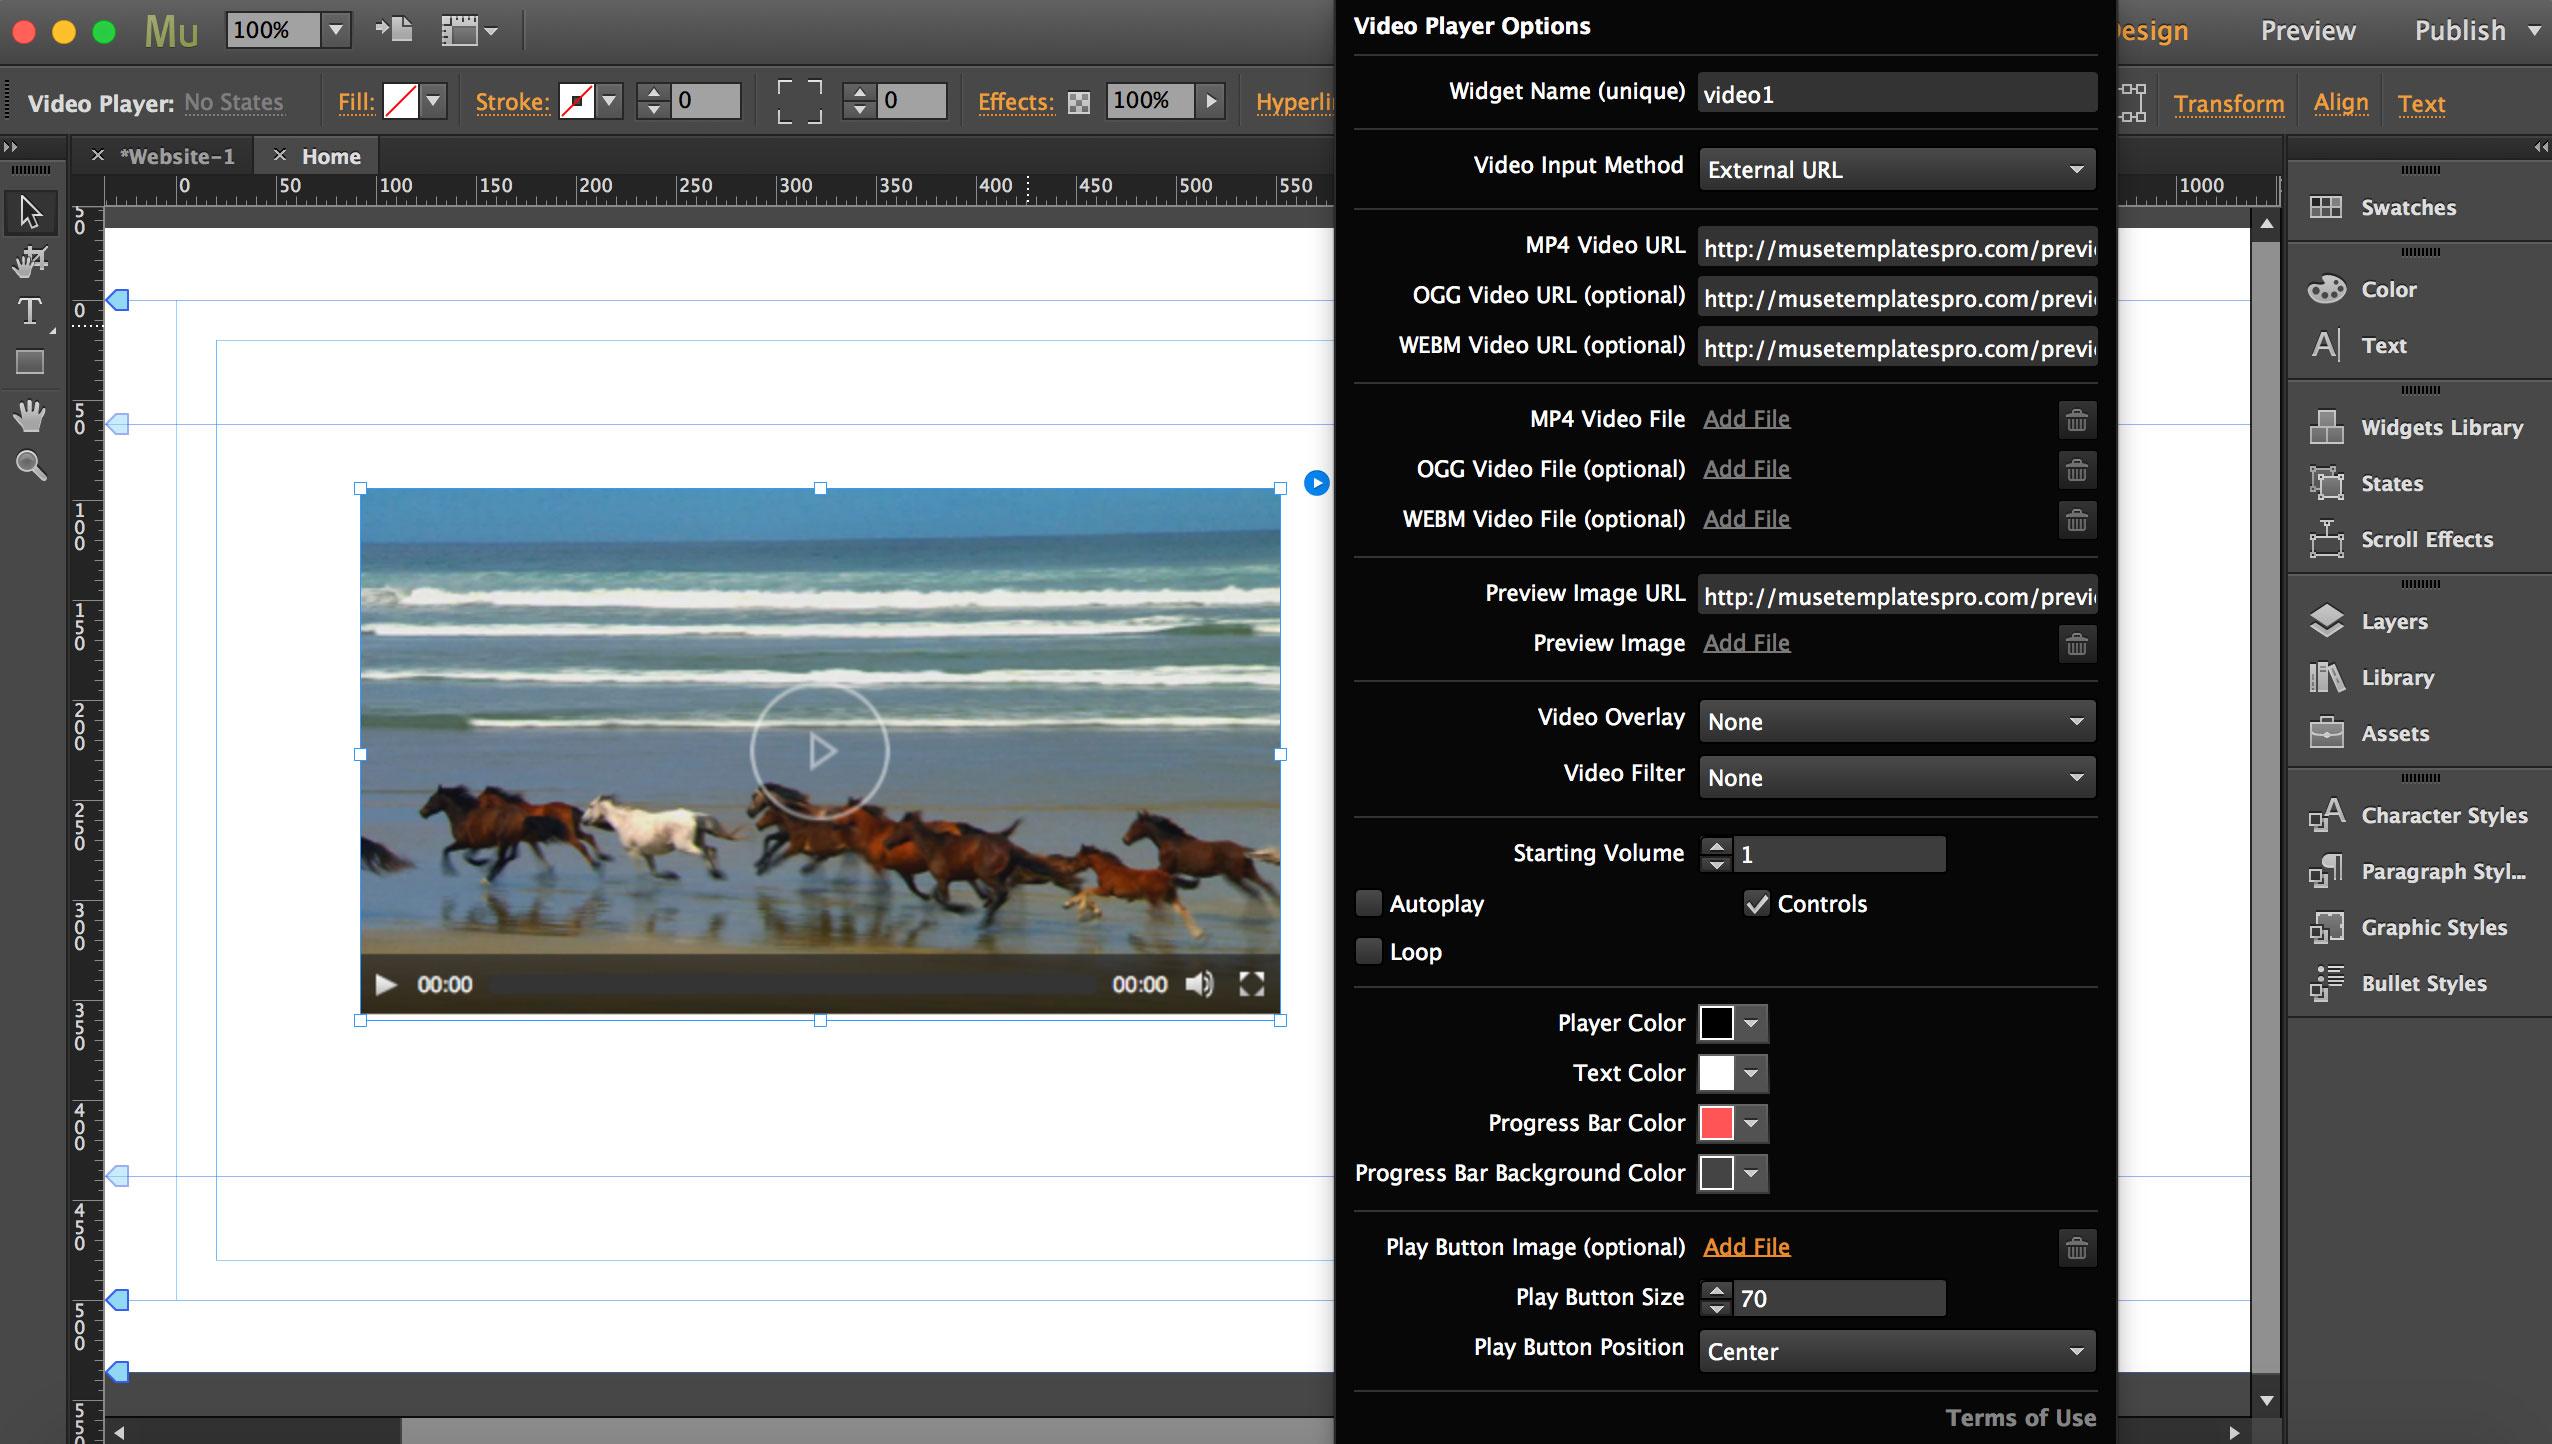 Adobe Muse Widgets Bundle